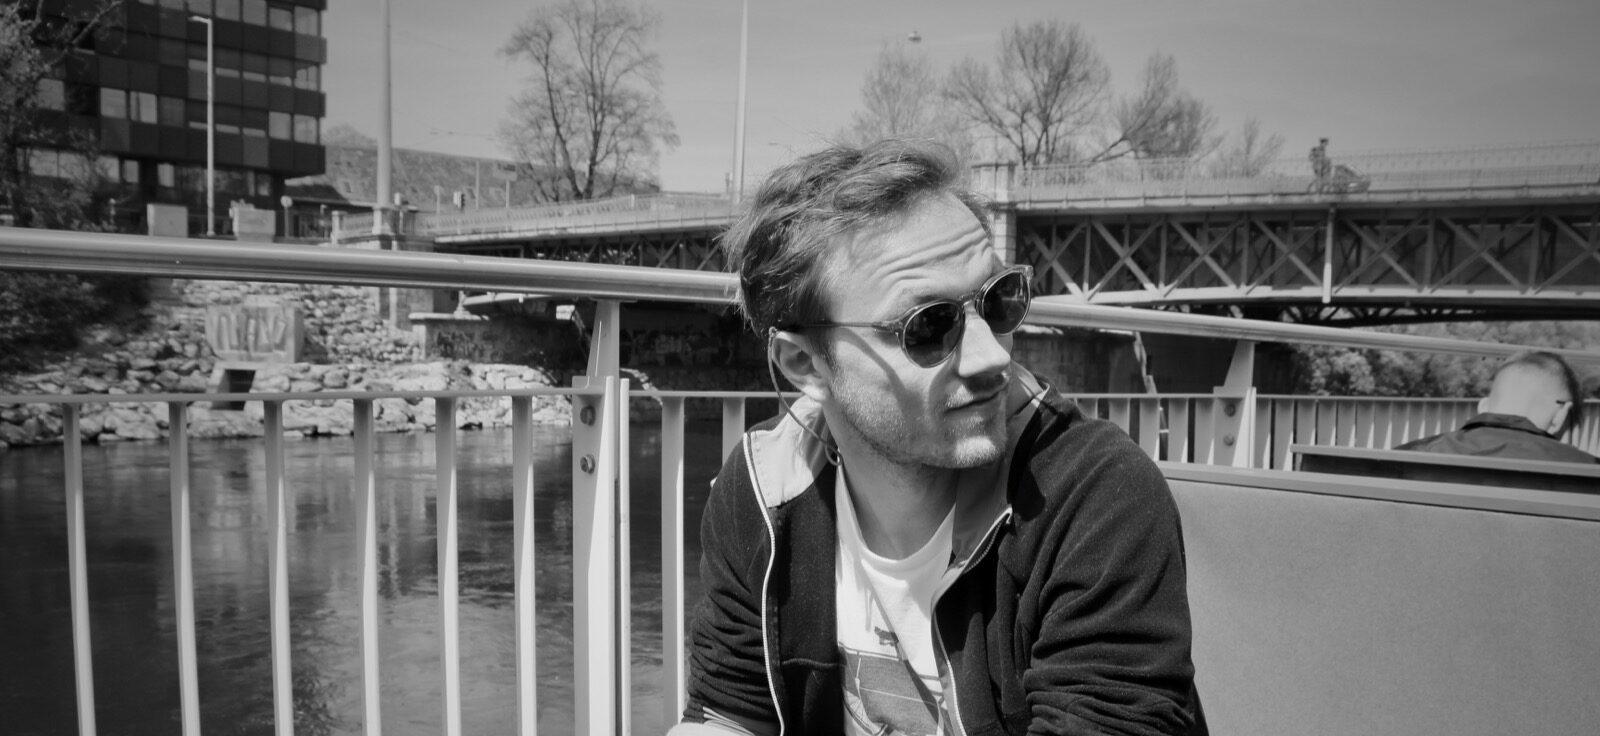 Prozessmanager Malwin Haas im Interview